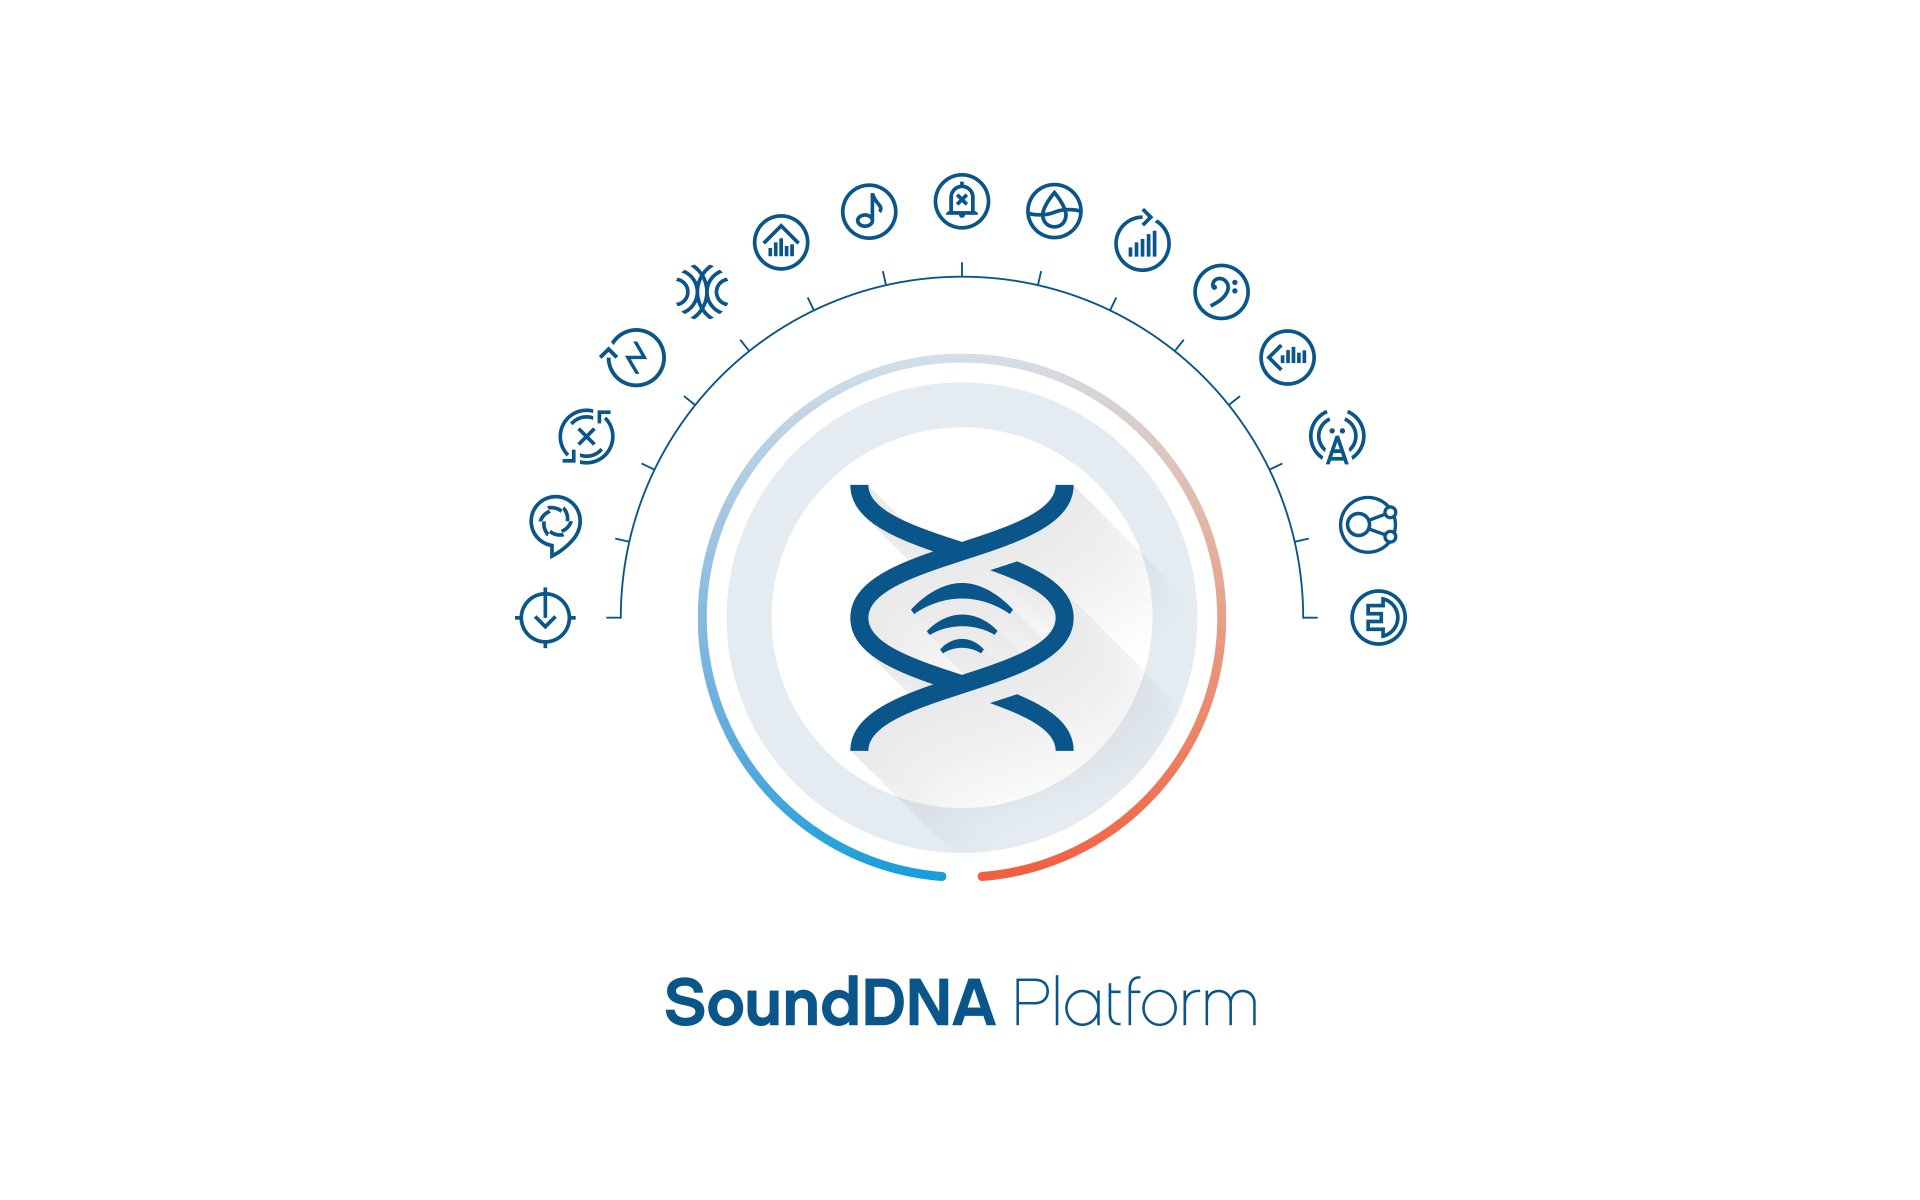 SoundDNA Platform